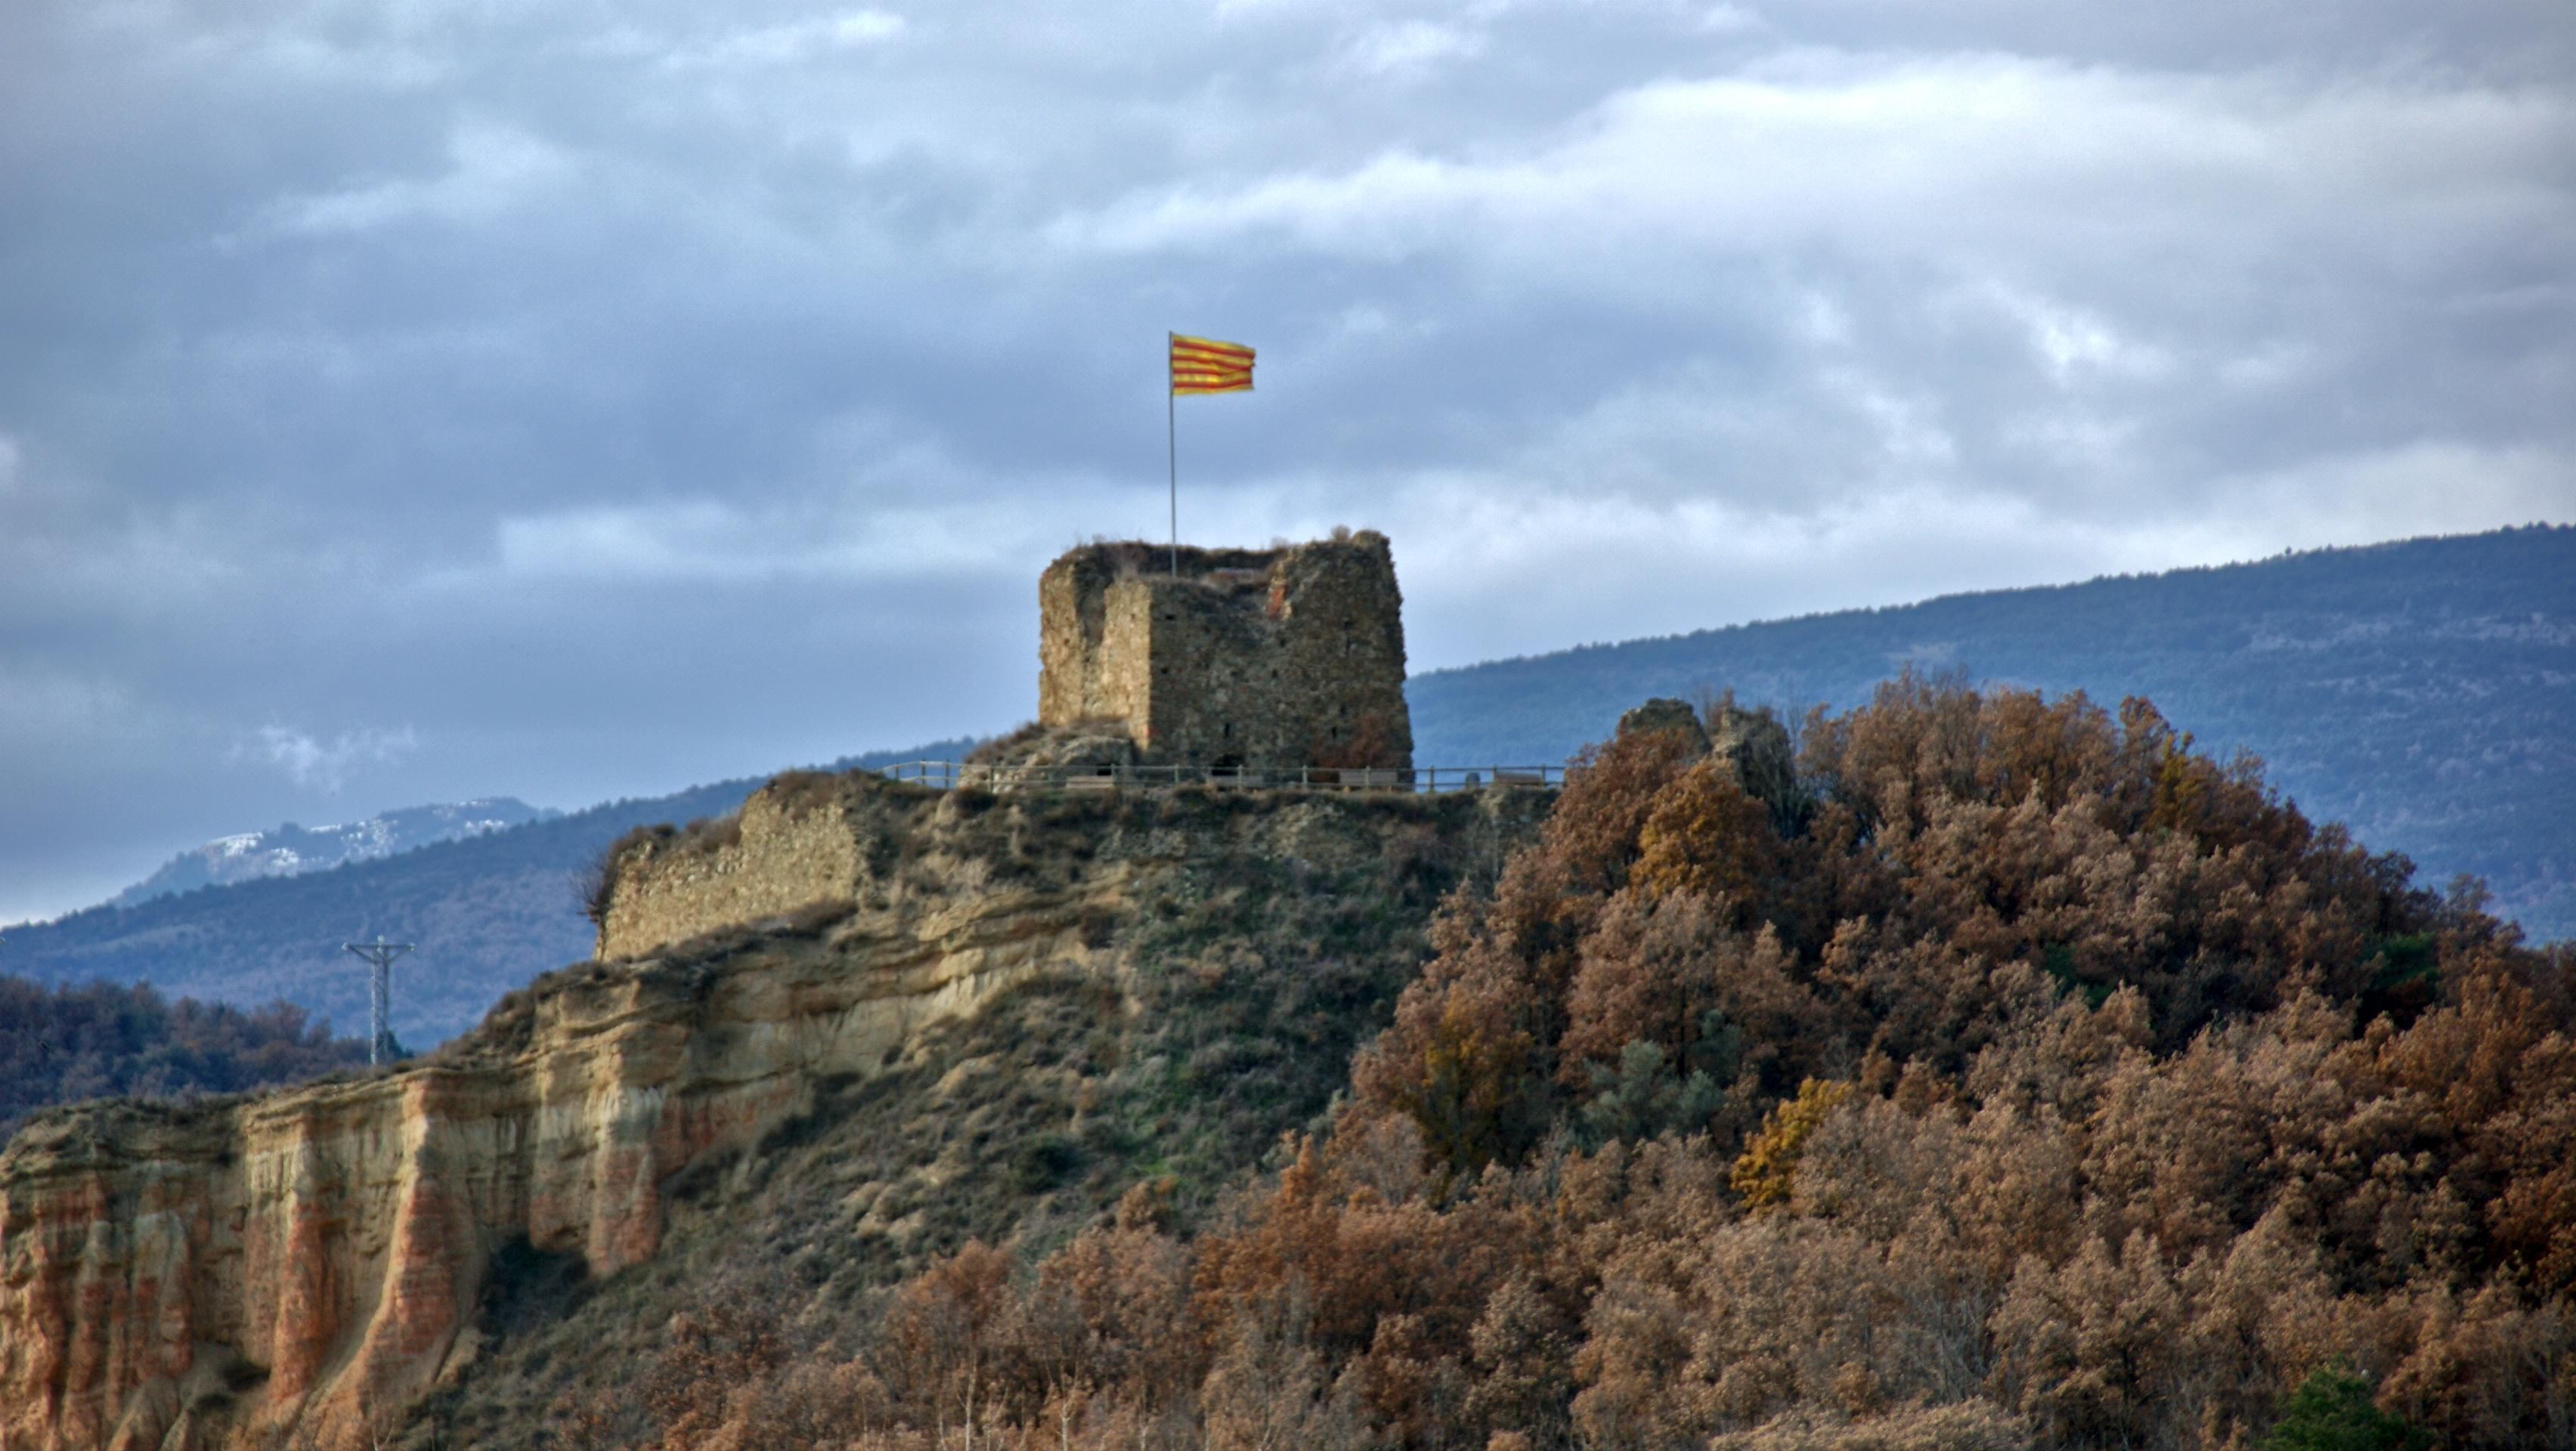 Solsona Spain  city pictures gallery : Torre Solsona La Seu d'Urgell 1 Wikimedia Commons